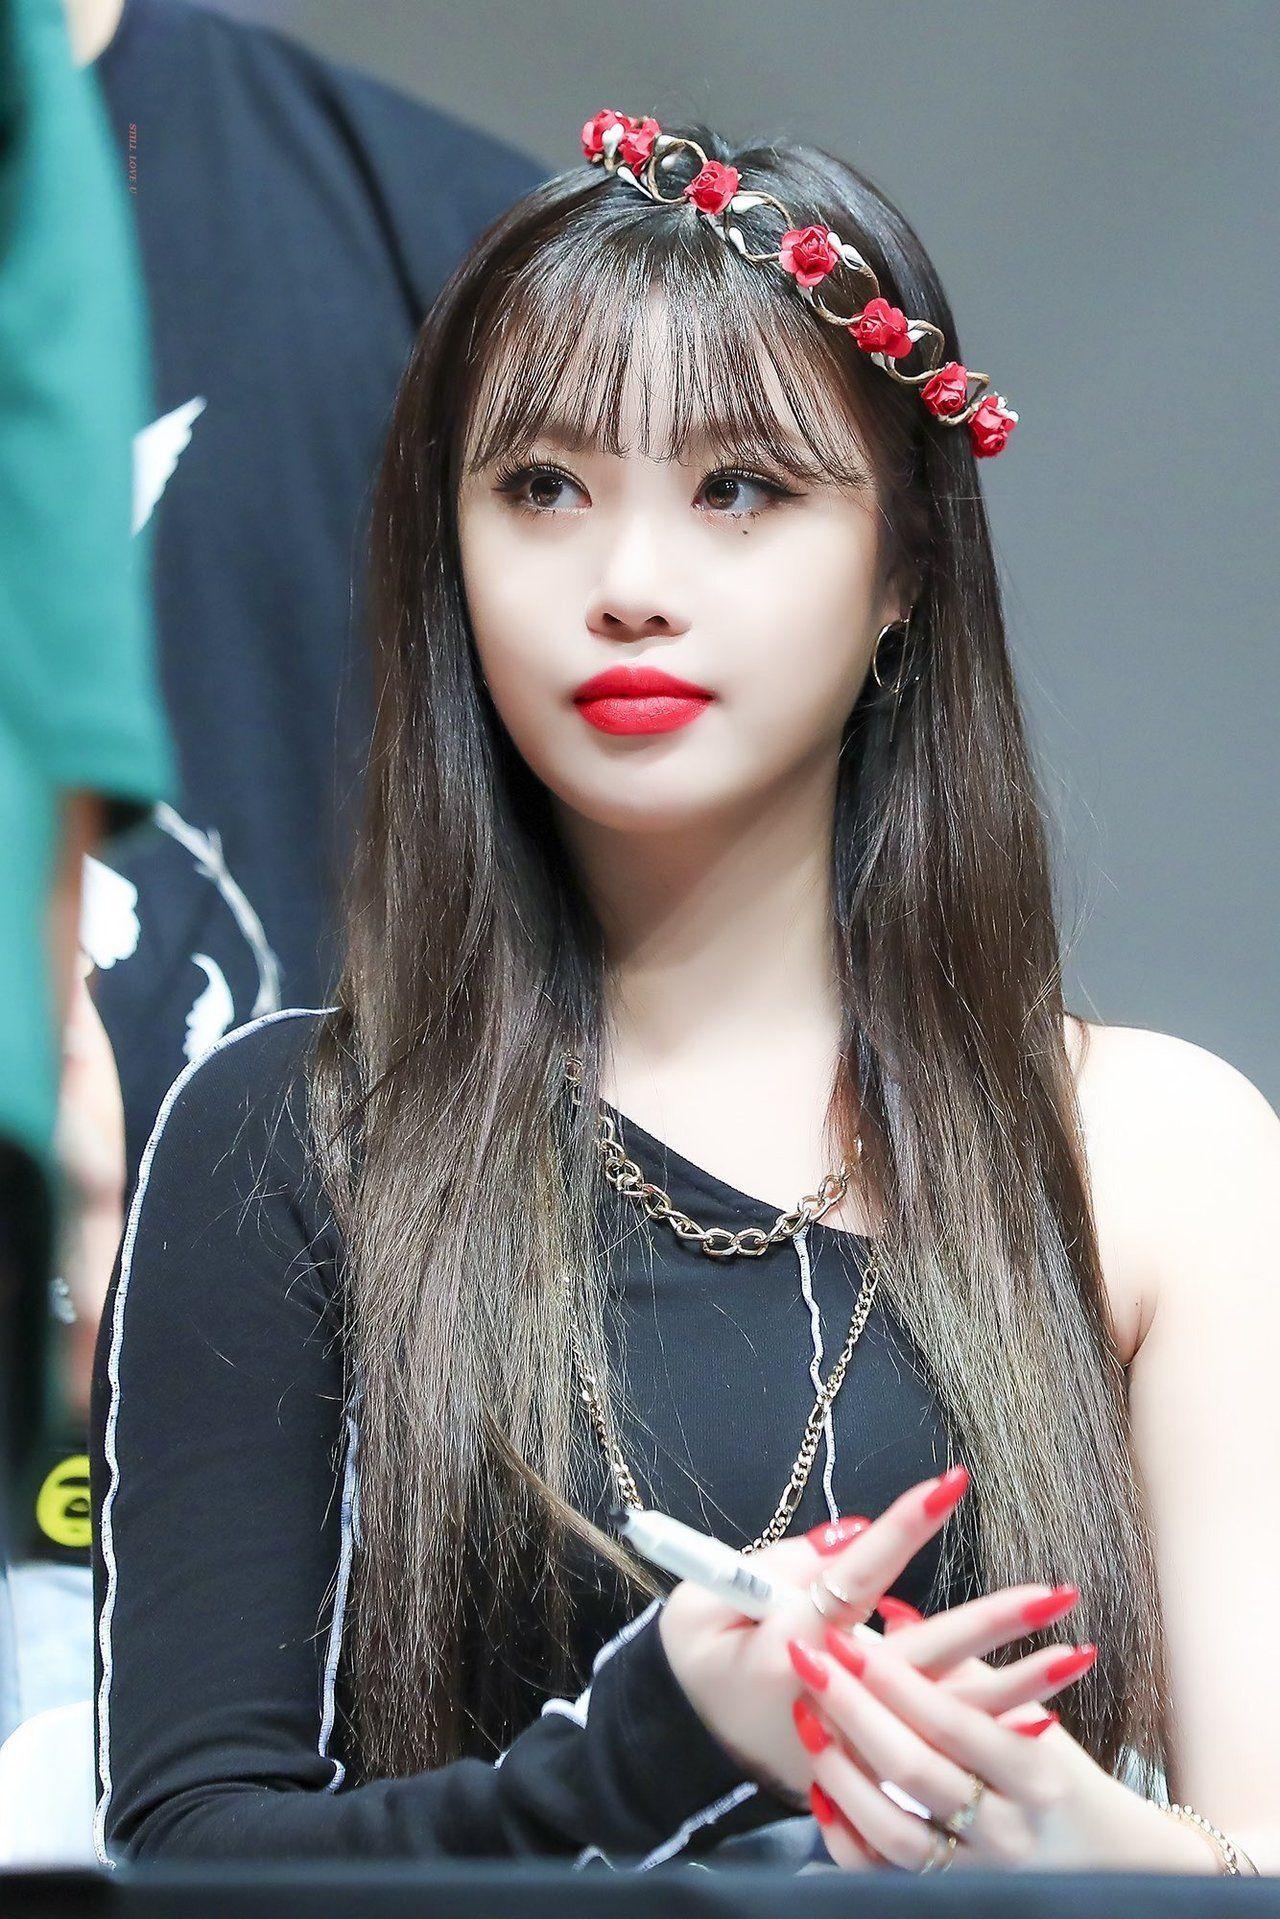 Pin By I M J On G Idle Kpop Girl Groups Kpop Girls Beauty